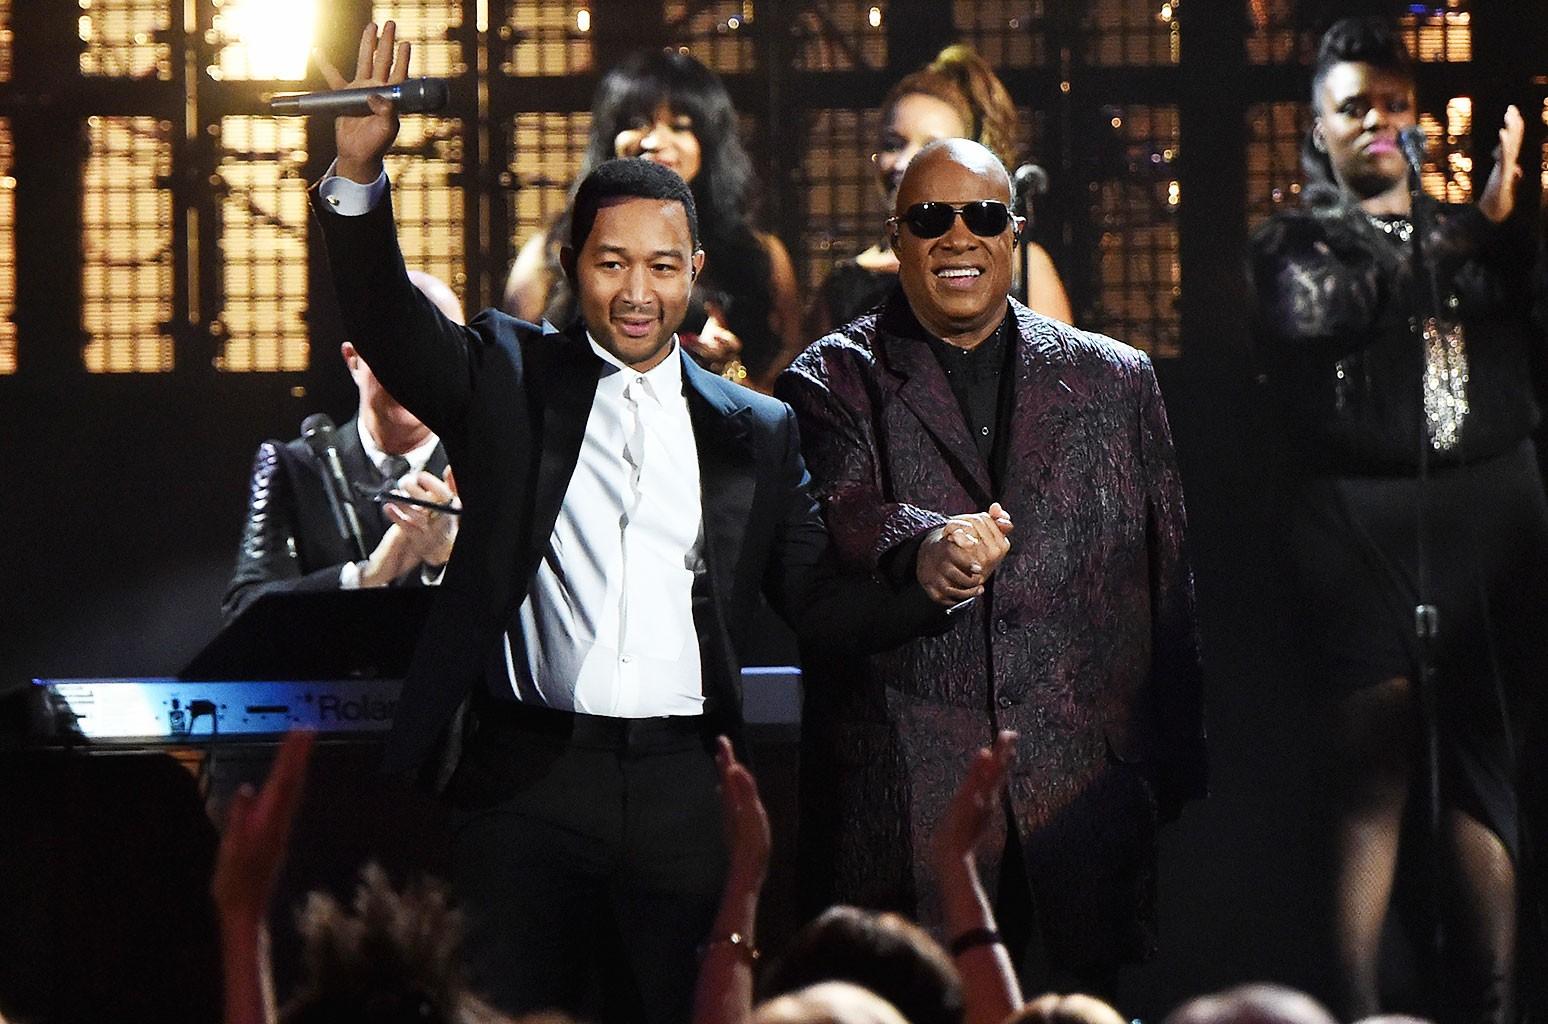 John Legend and Stevie Wonder